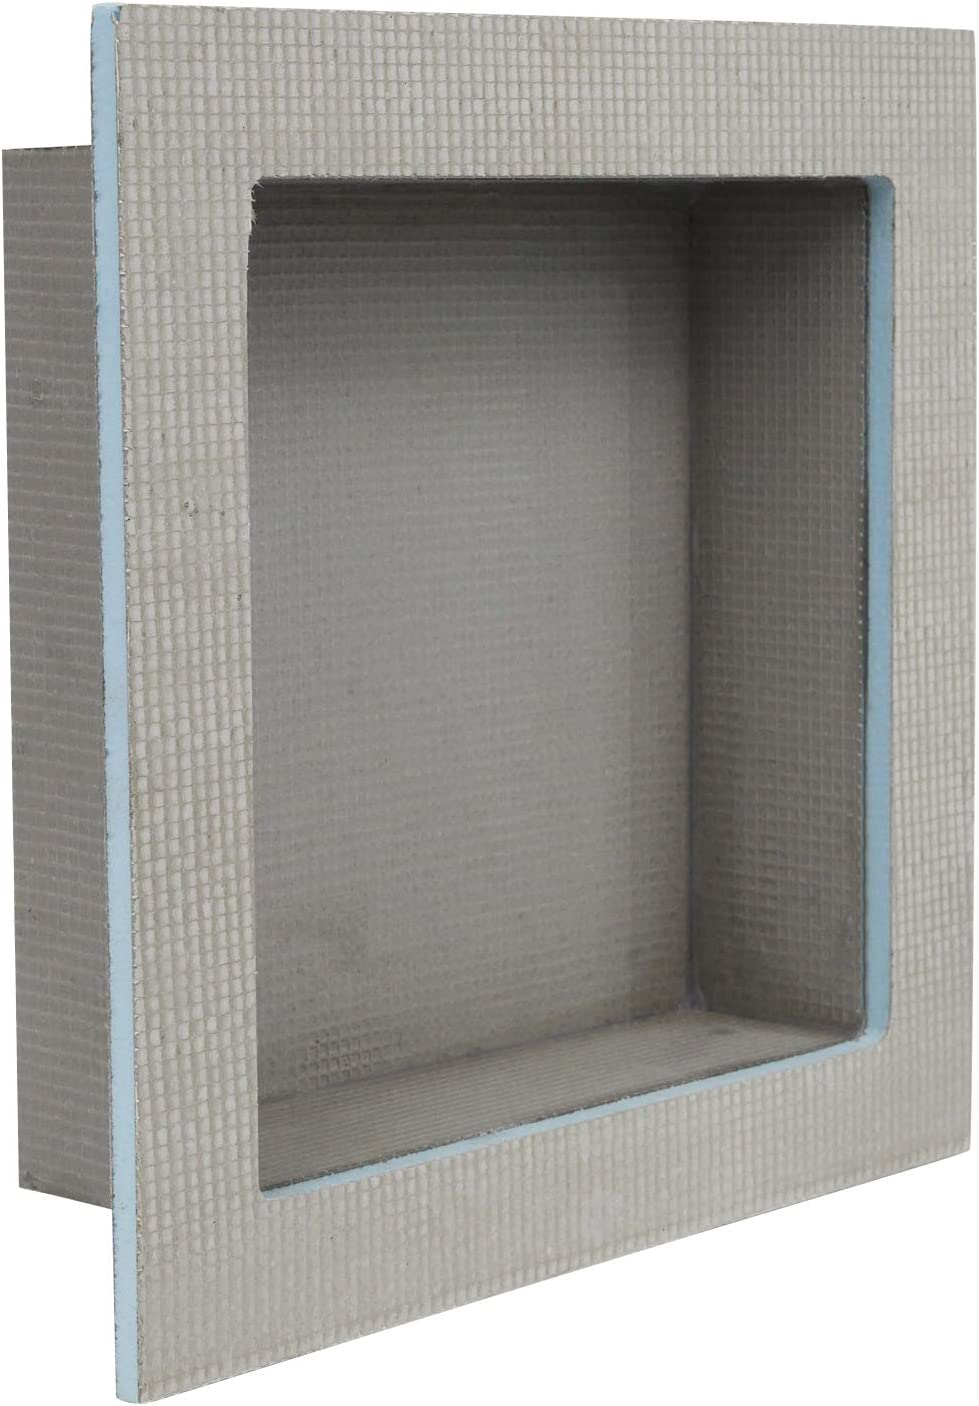 "Houseables Shower Niche, Insert Storage Shelf, 12x12 Inch, Installation Size: 13""x13"", Grey, XPS Foam, Leak-Proof, Waterproof, Recessed Preformed Caddy, Tile Prefab Shelves for Bathroom, Prefabricated"